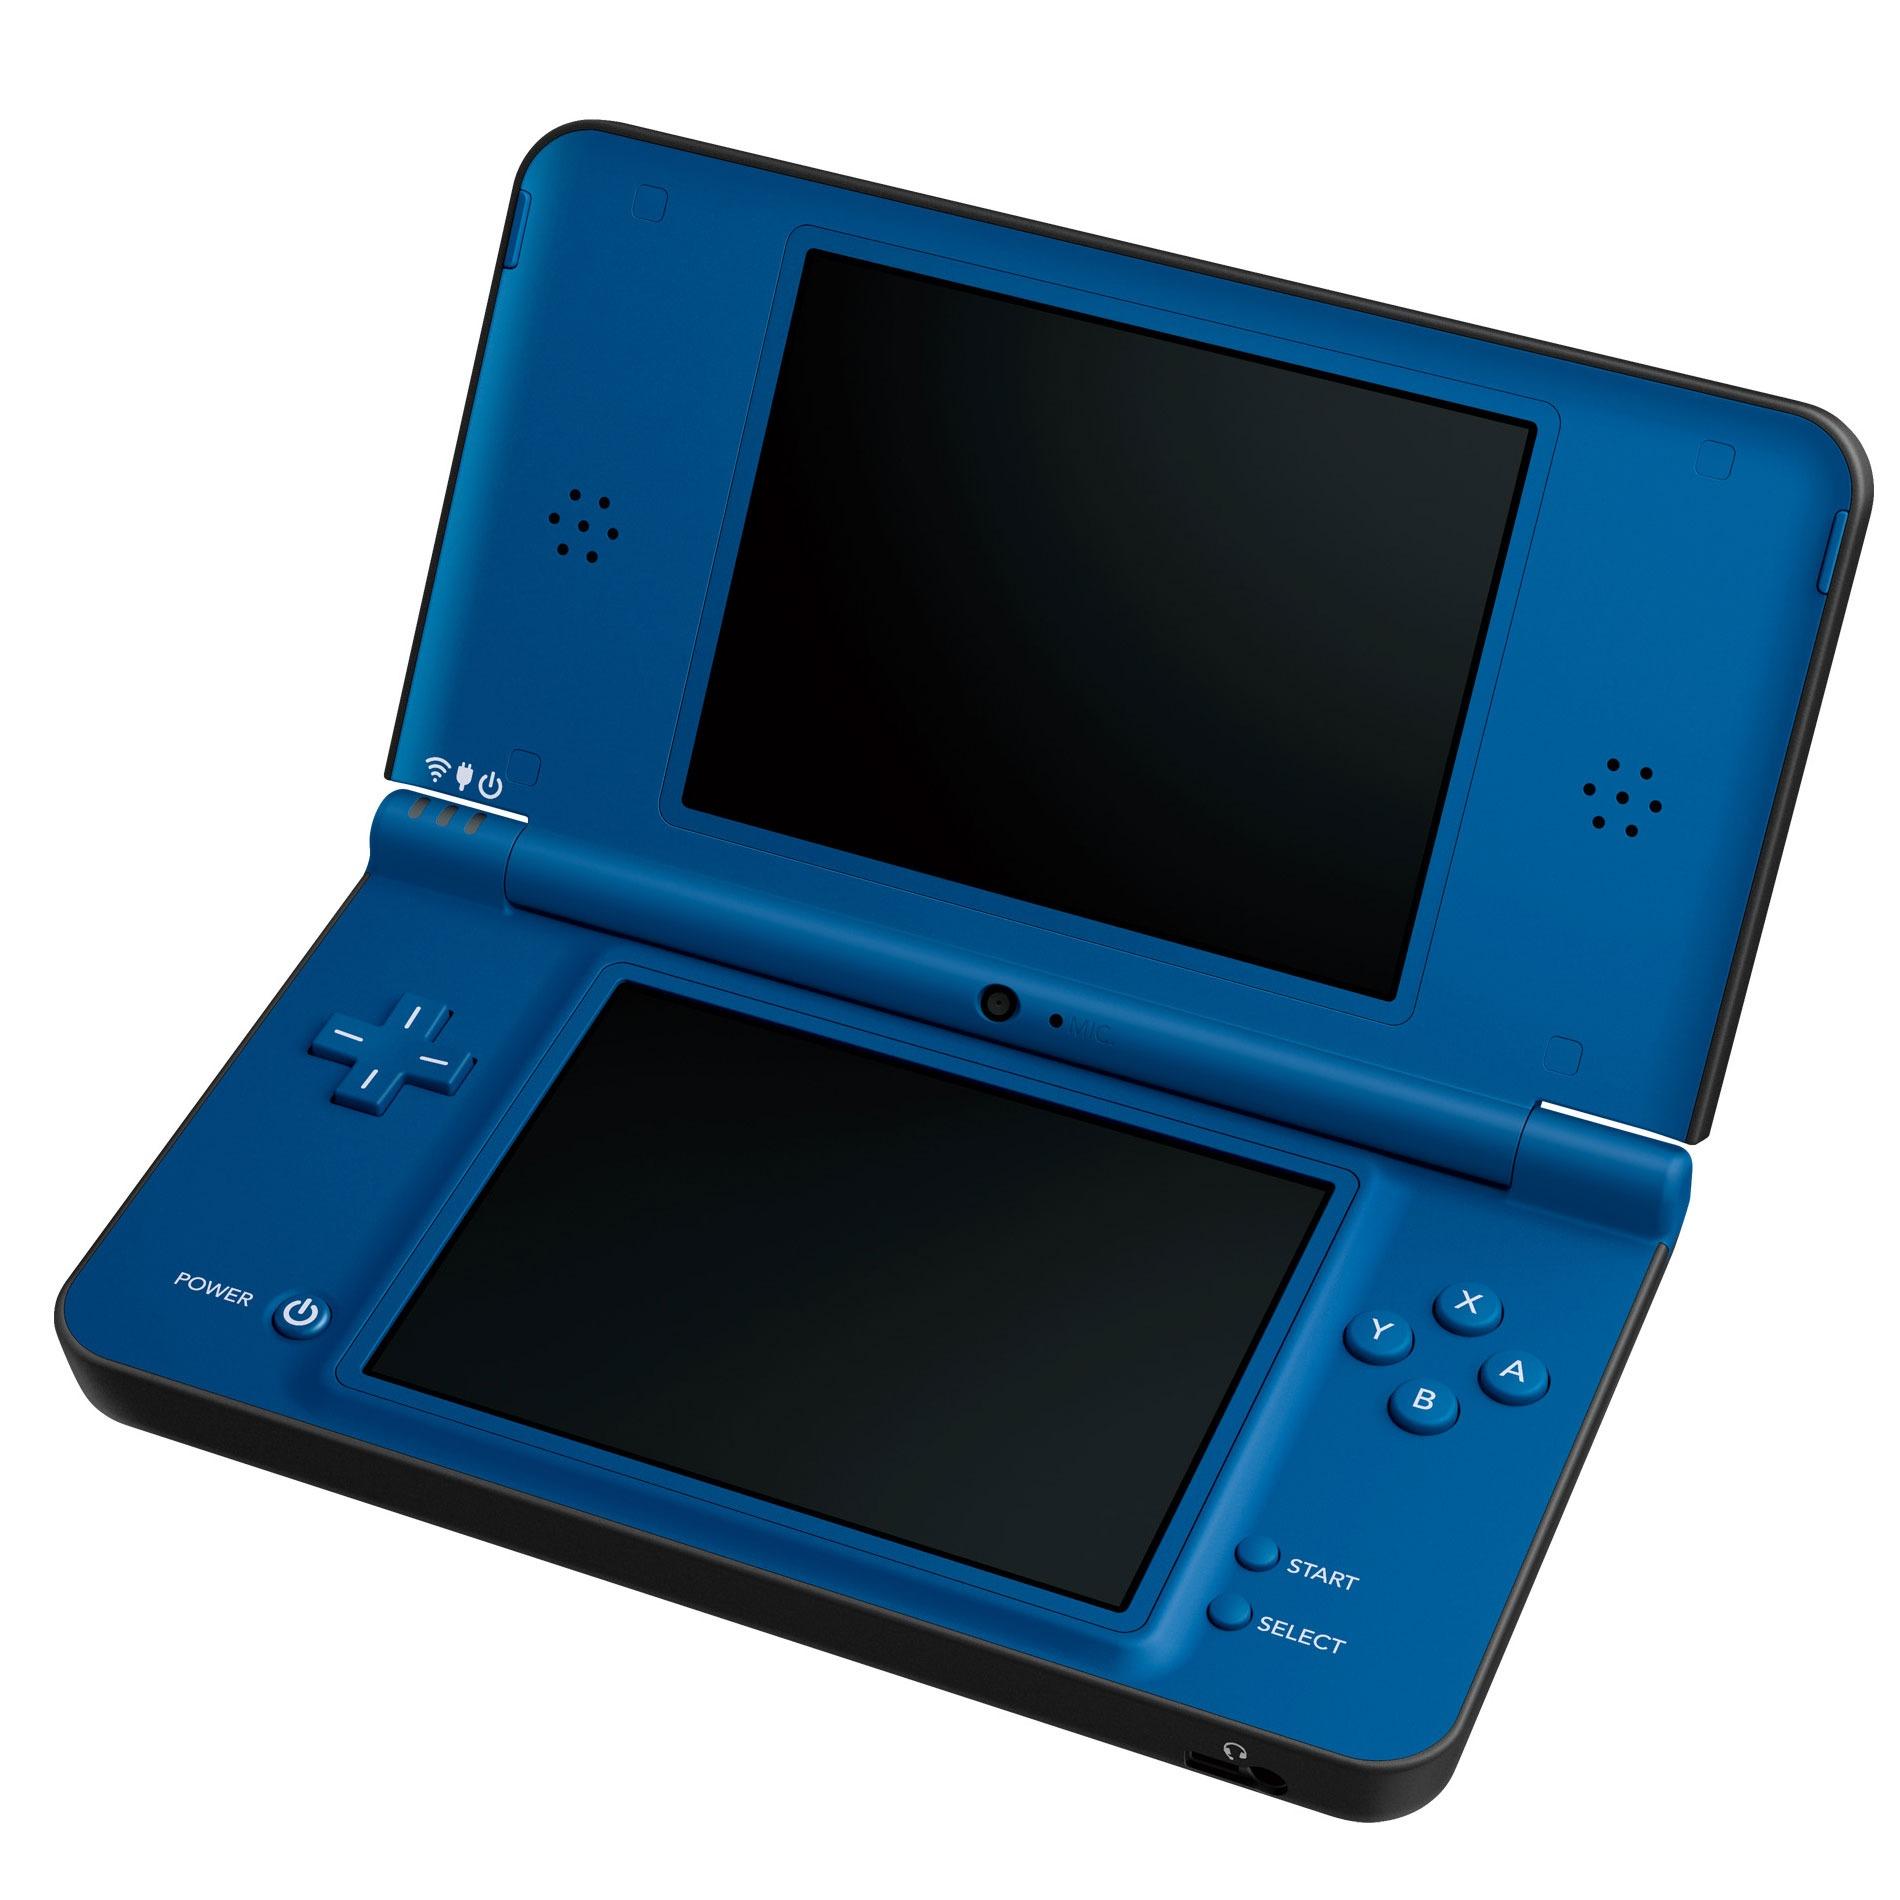 Nintendo launching blue DSi XL this July